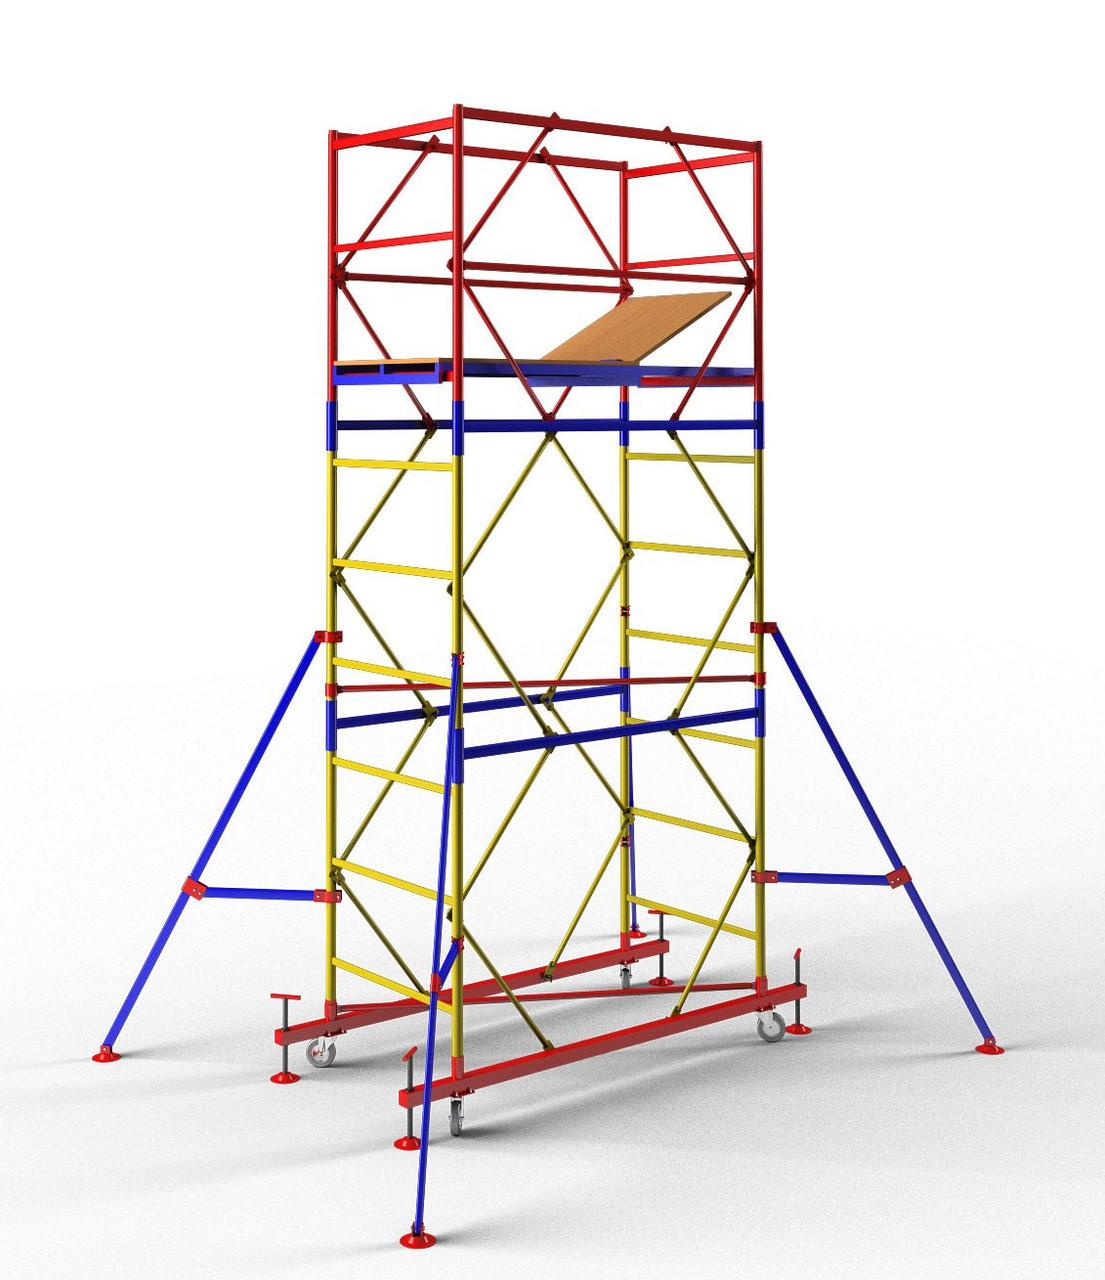 Вышка-тура мобильная облегченная 1,2 х 2,0 м (13+1) Раб.высота 18,2 м